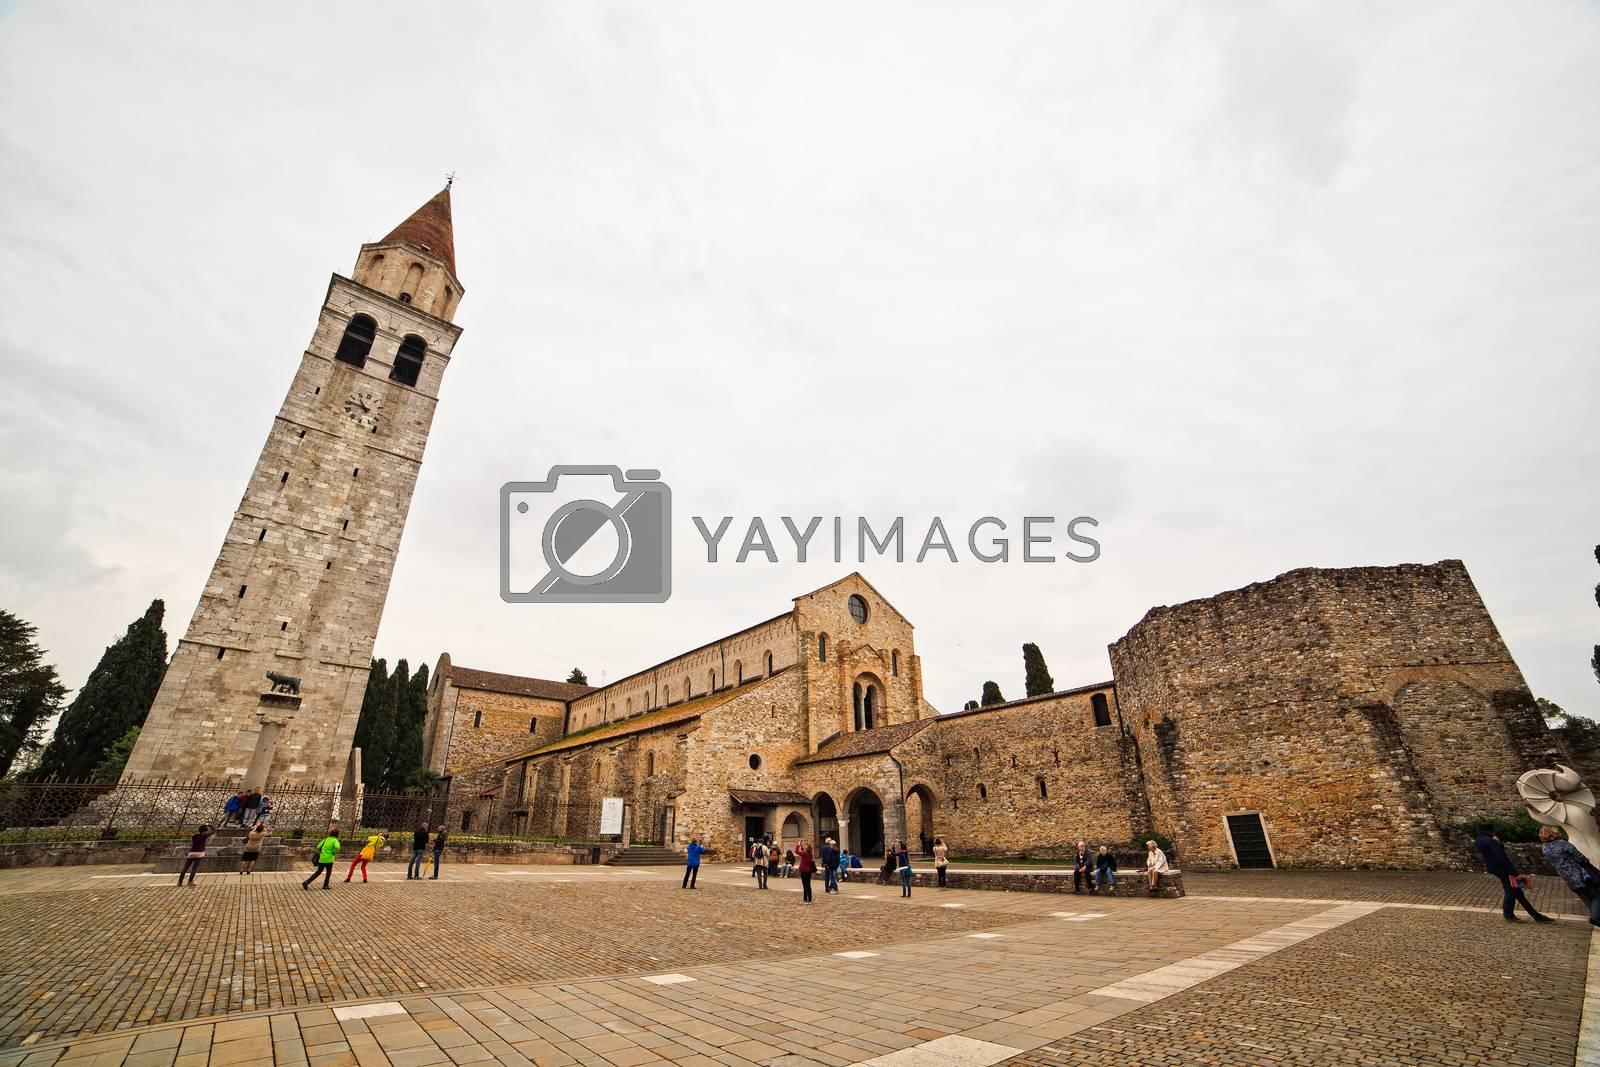 Basilica di Santa Maria Assunta and bell tower of Aquileia, Ital by bepsimage